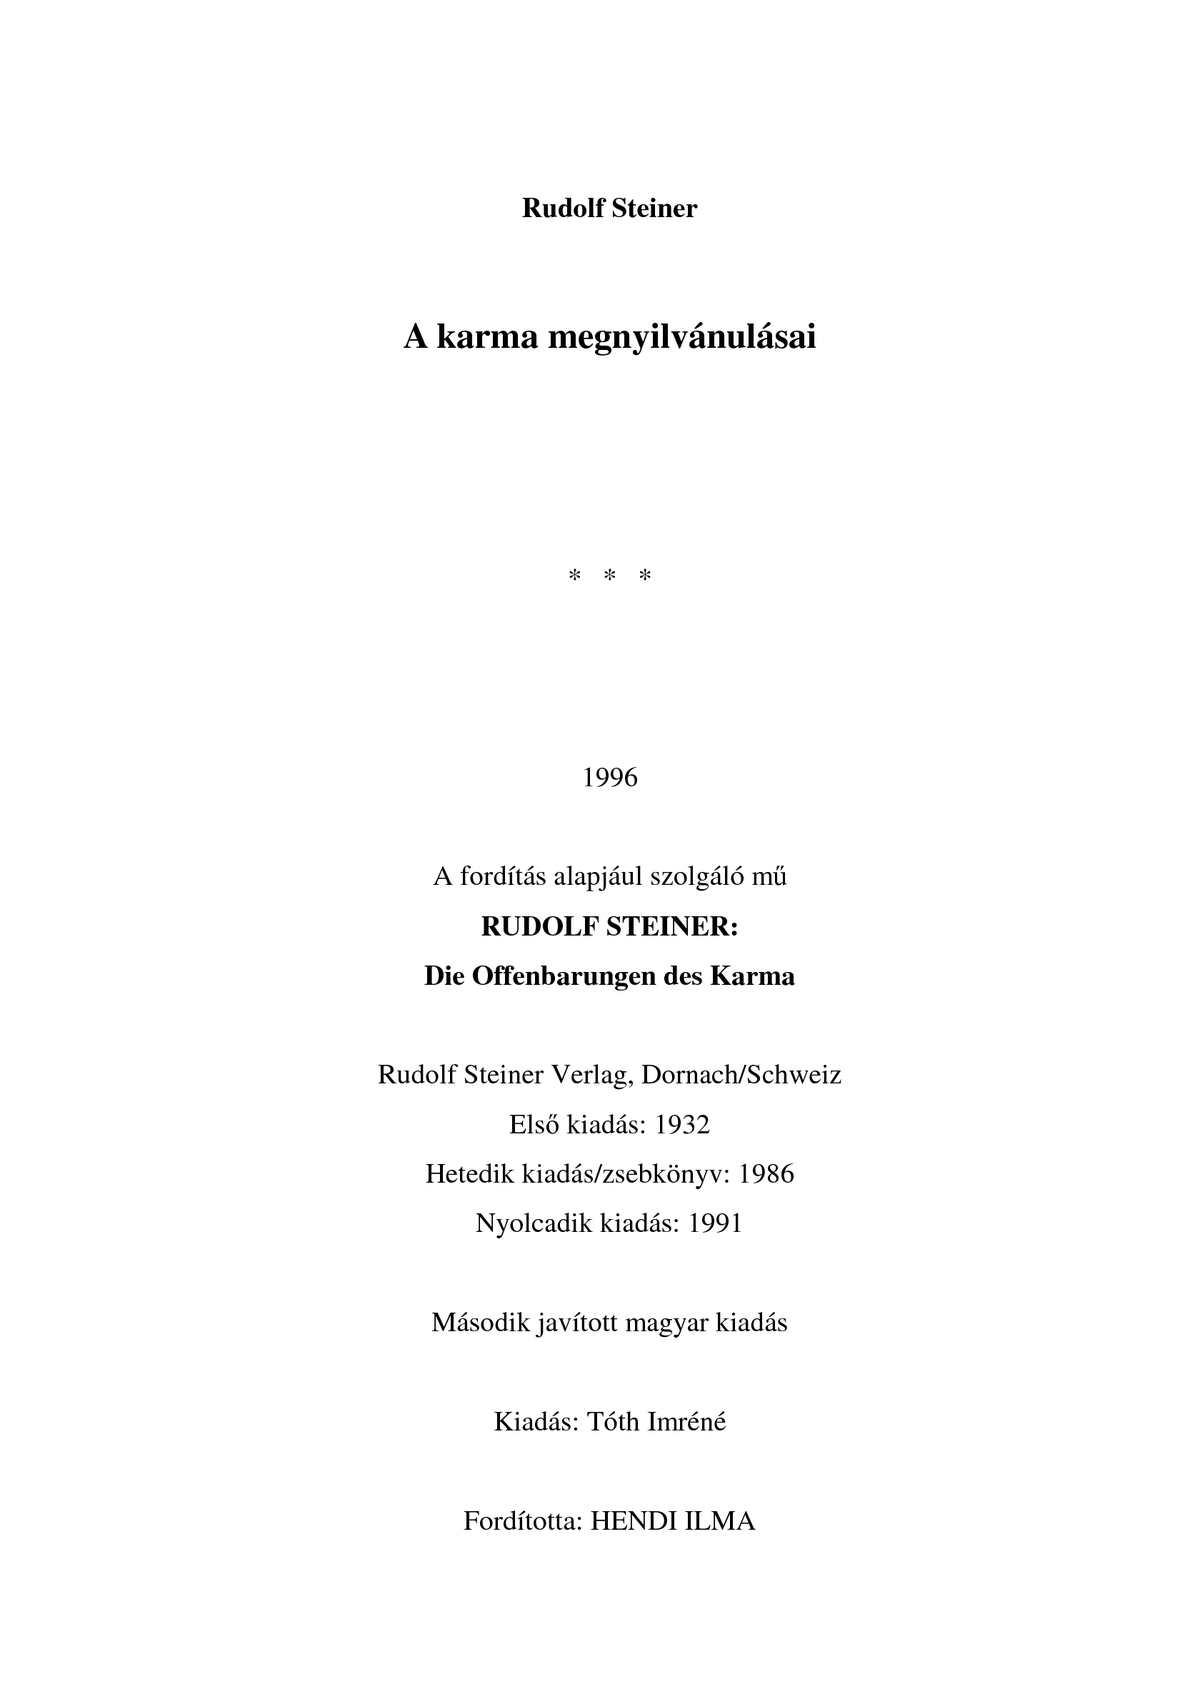 Calaméo - Rudolf Steiner - A Karma Megnyilvánulásai 253d0735b2